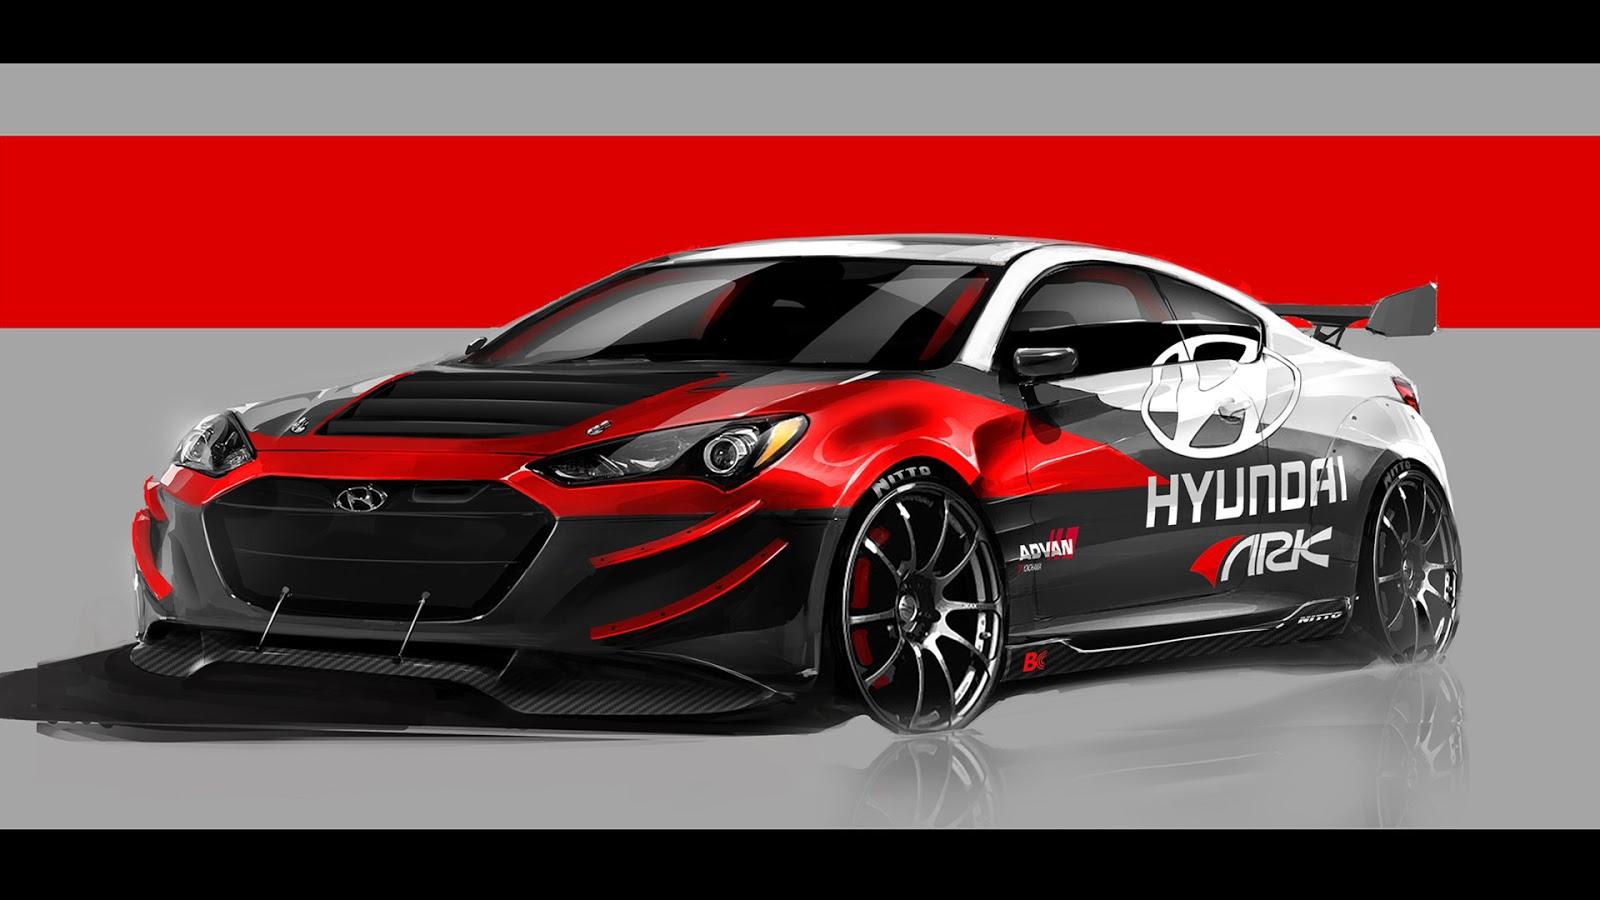 http://1.bp.blogspot.com/--qfcKfuJQbg/UOYMIJBMS6I/AAAAAAAAPDw/CY_VComvZyQ/s1600/2012_hyundai_genesis_coupe_r-HD.jpg